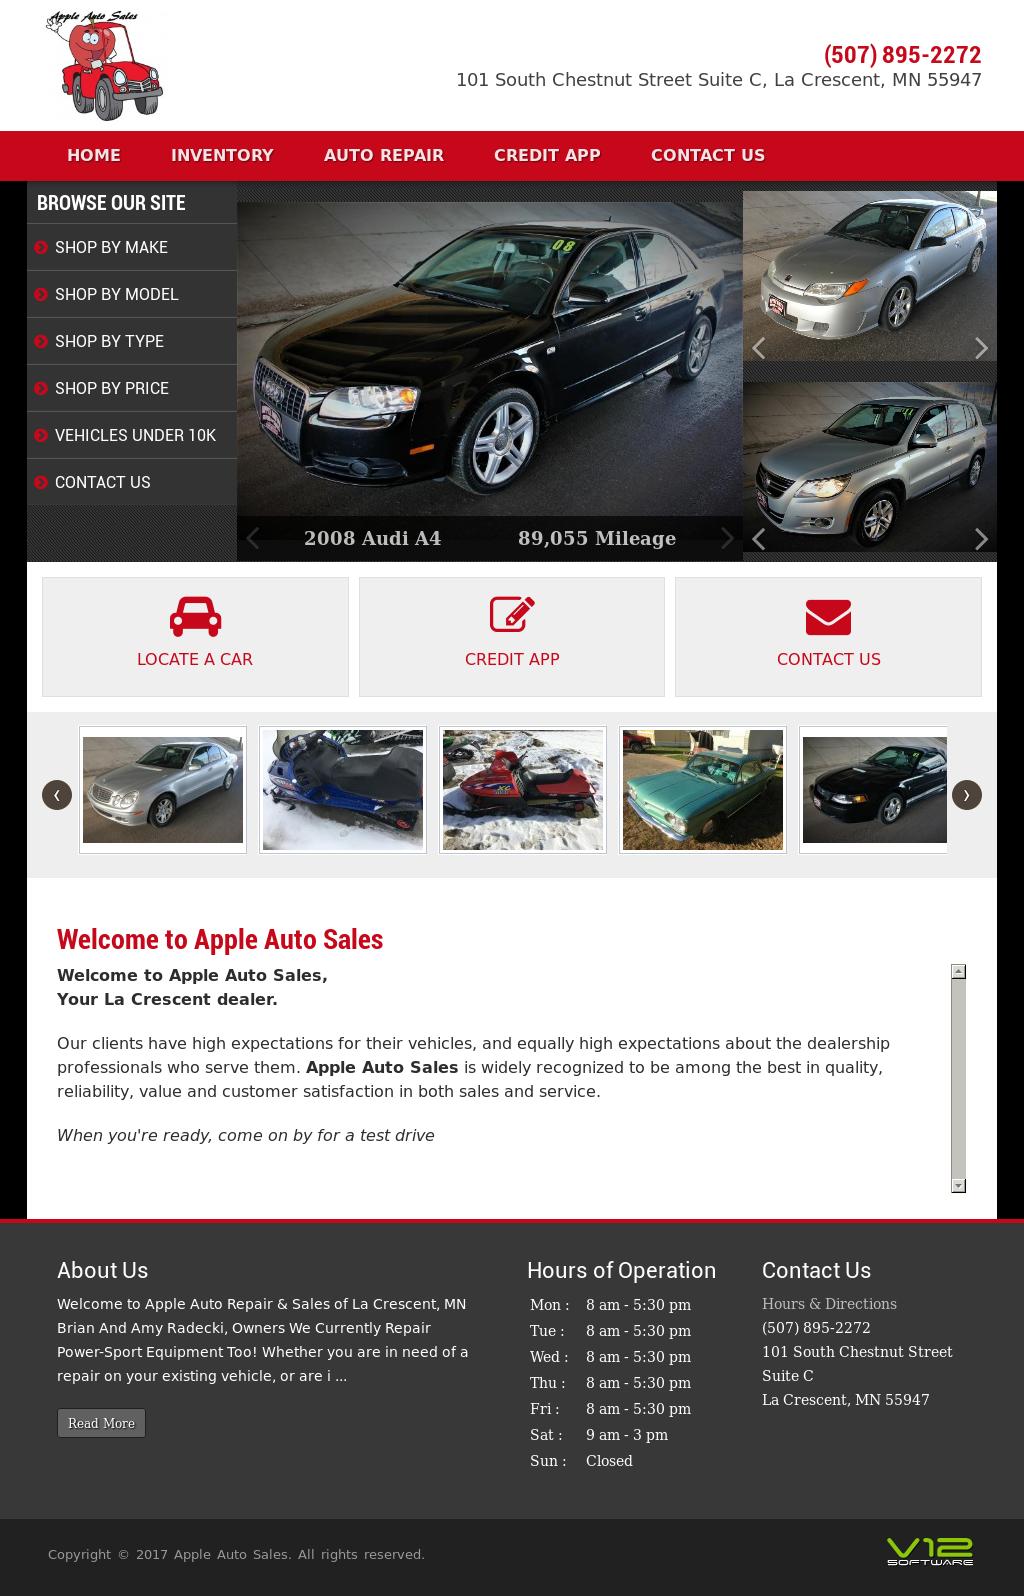 Apple Auto Sales >> Apple Auto Repair And Sales Competitors Revenue And